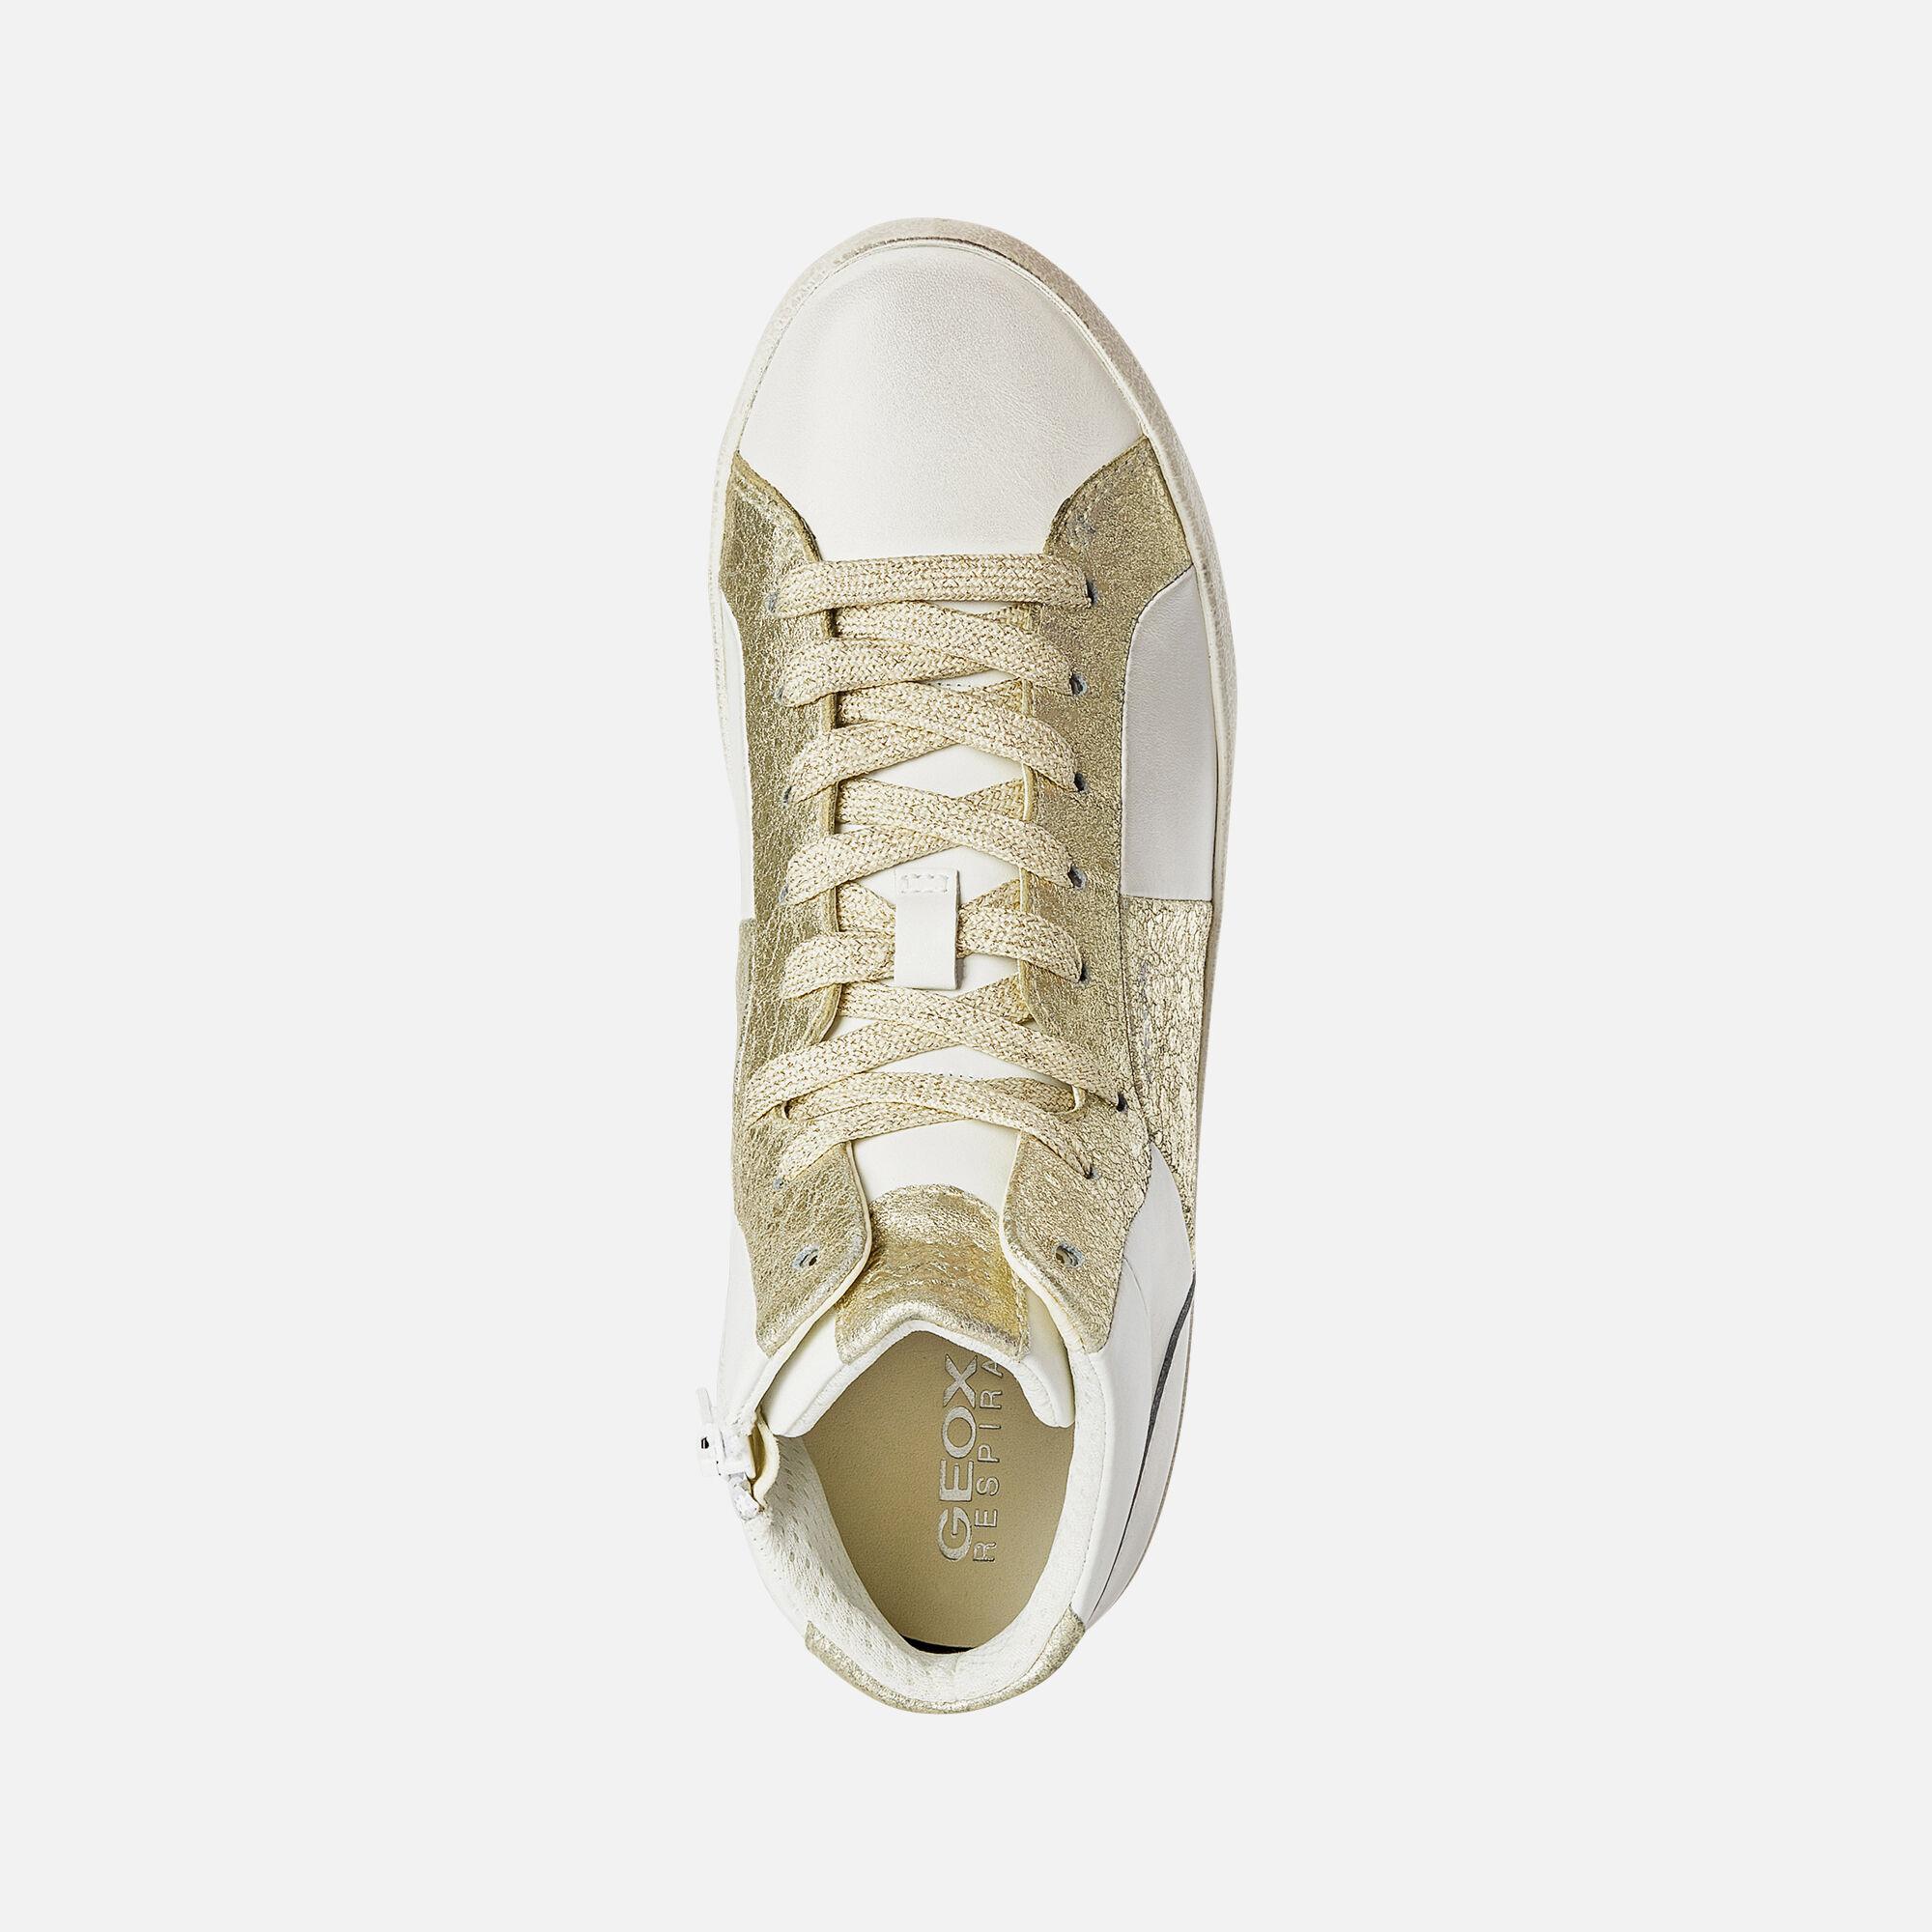 SCARPE DONNA GEOX RESPIRA dorate oro beige sneakers senza